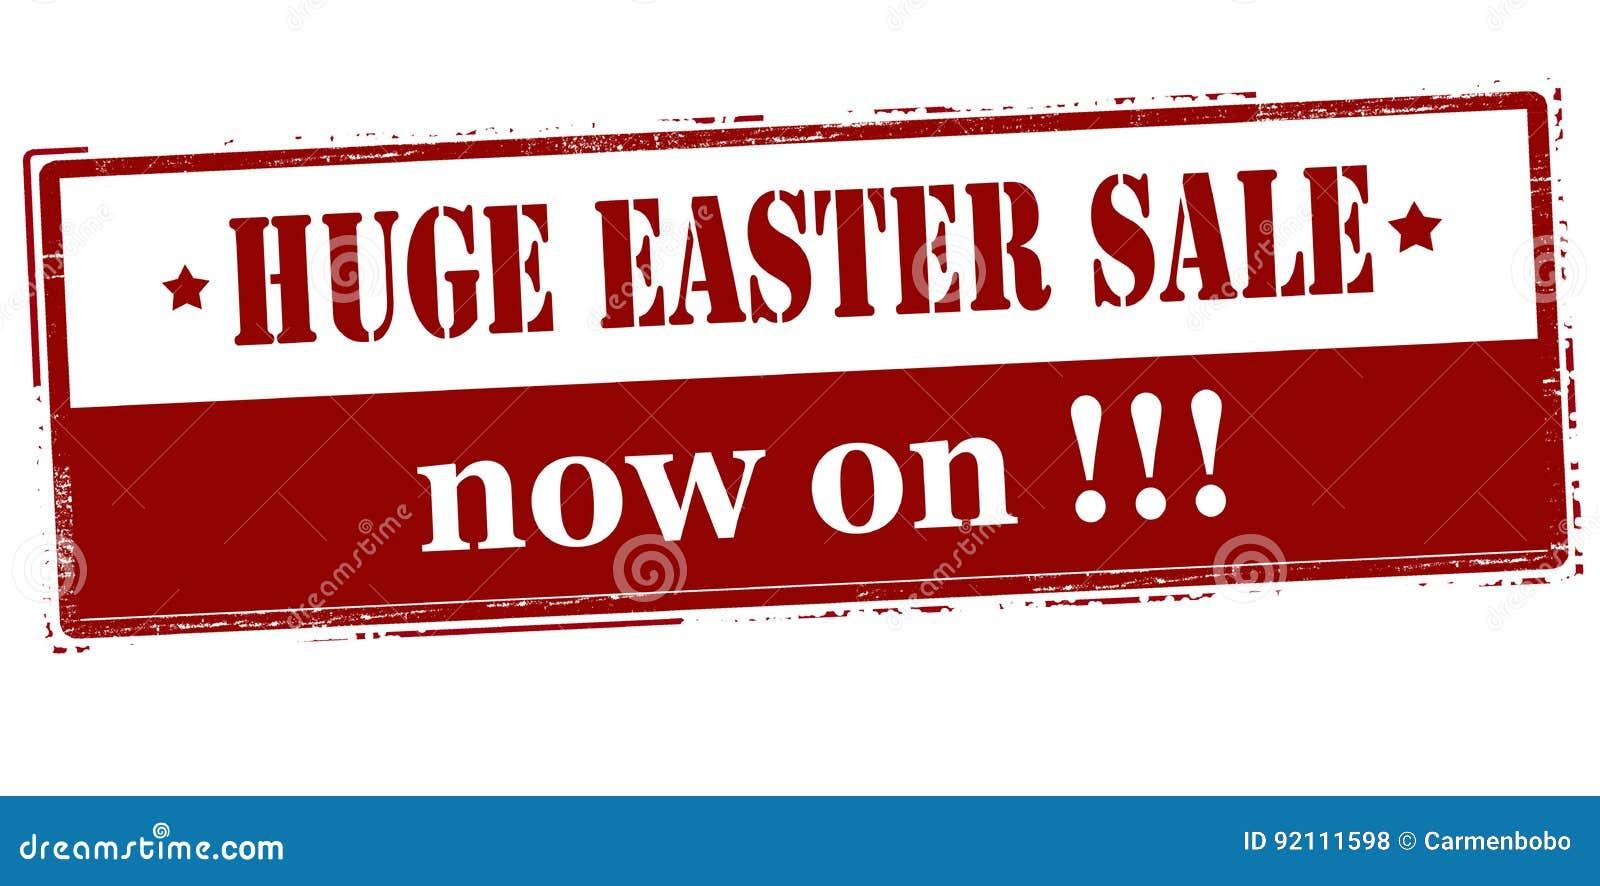 Huge Easter sale now on